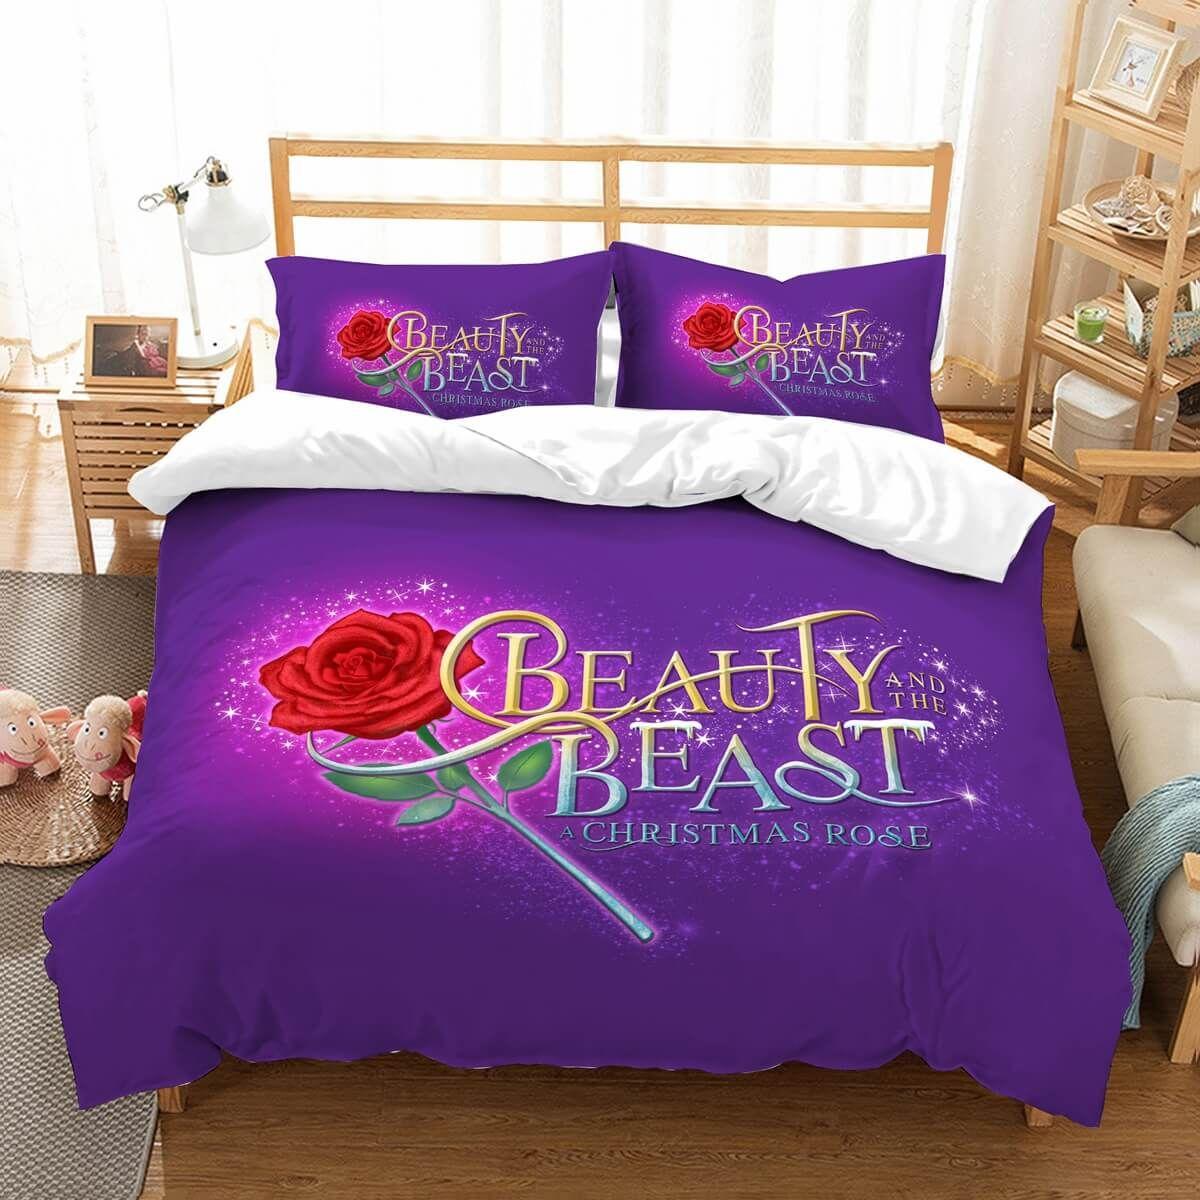 3d Customize Beauty And The Beast Bedding Set Duvet Cover Bedroom Bedlinen Sets